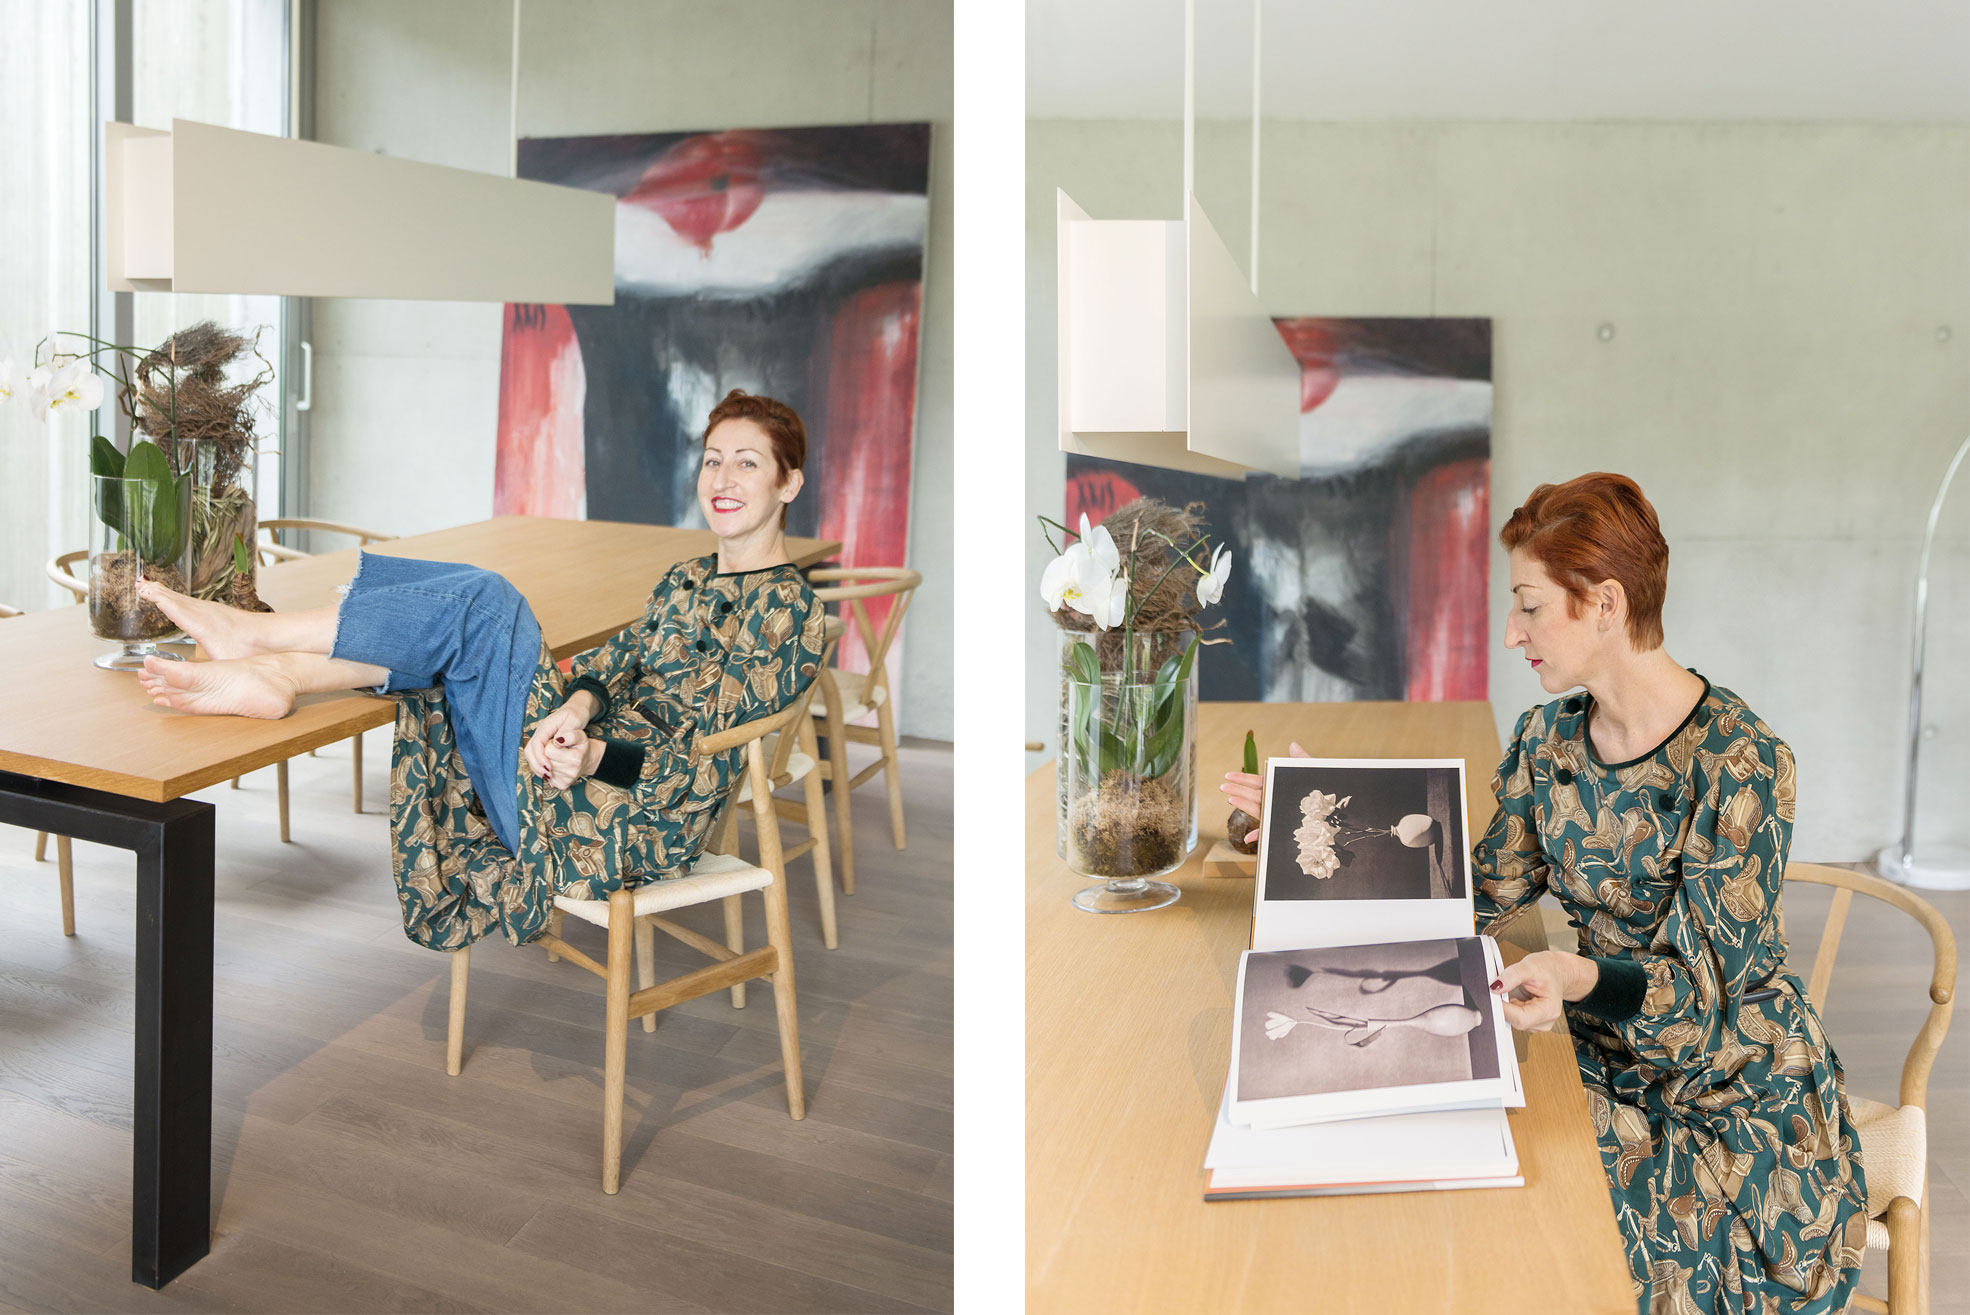 Portrait of Rosalba Piccinni in her villa Photographer Maria Teresa Furnari